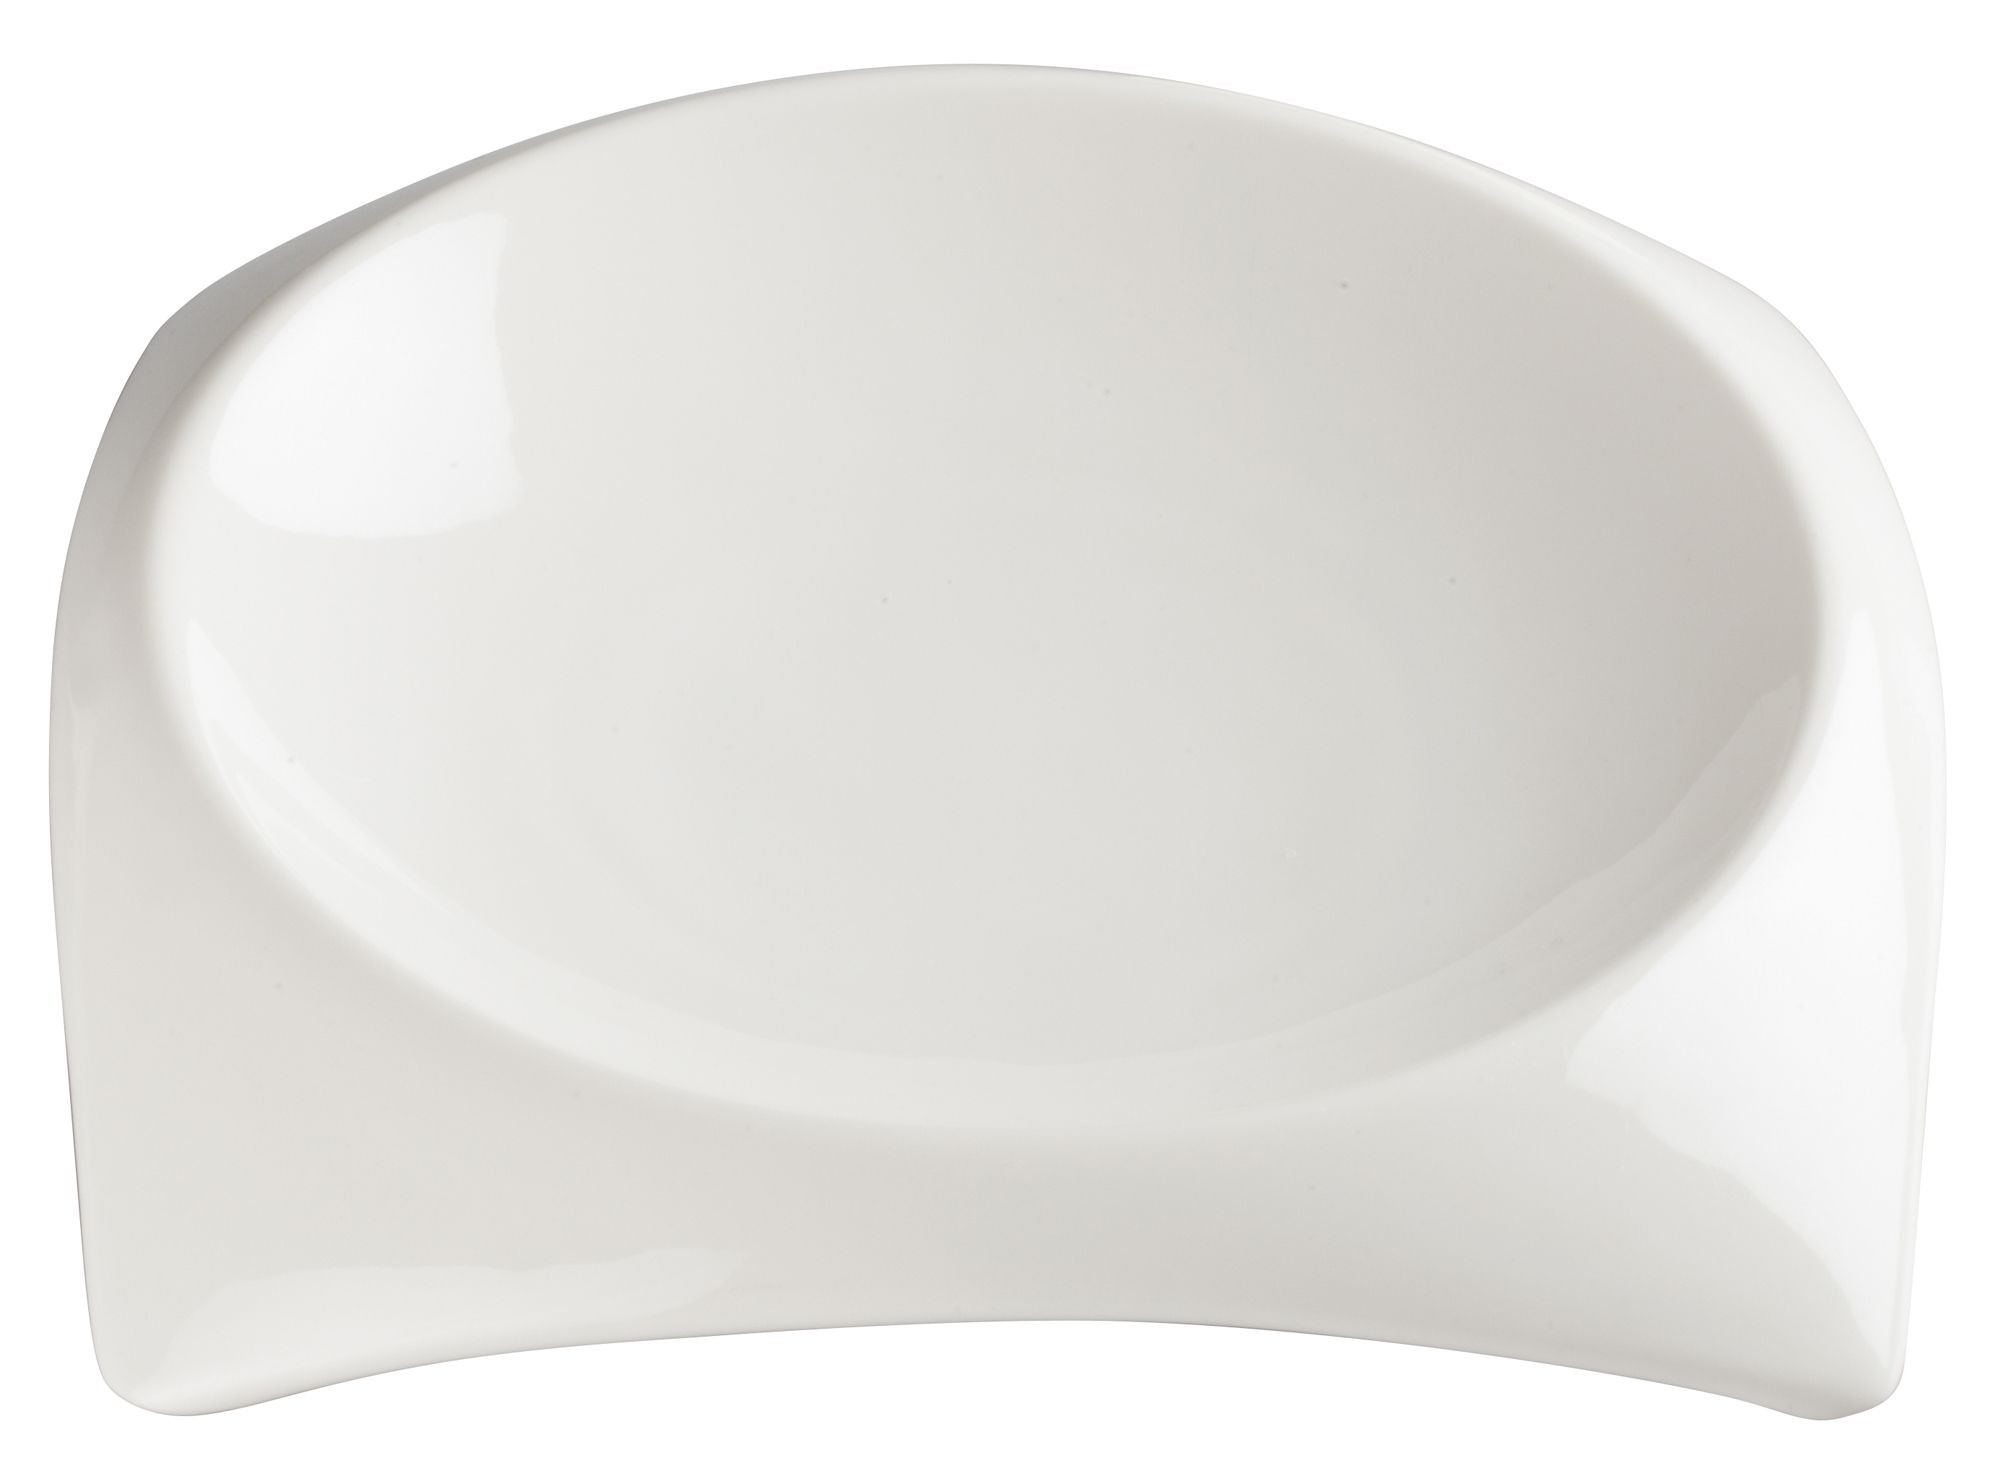 "Winco WDP005-102 Carzola Porcelain Bright White Square Deep Bowl 7-3/4"" Sq (6-3/4"" Dia)"